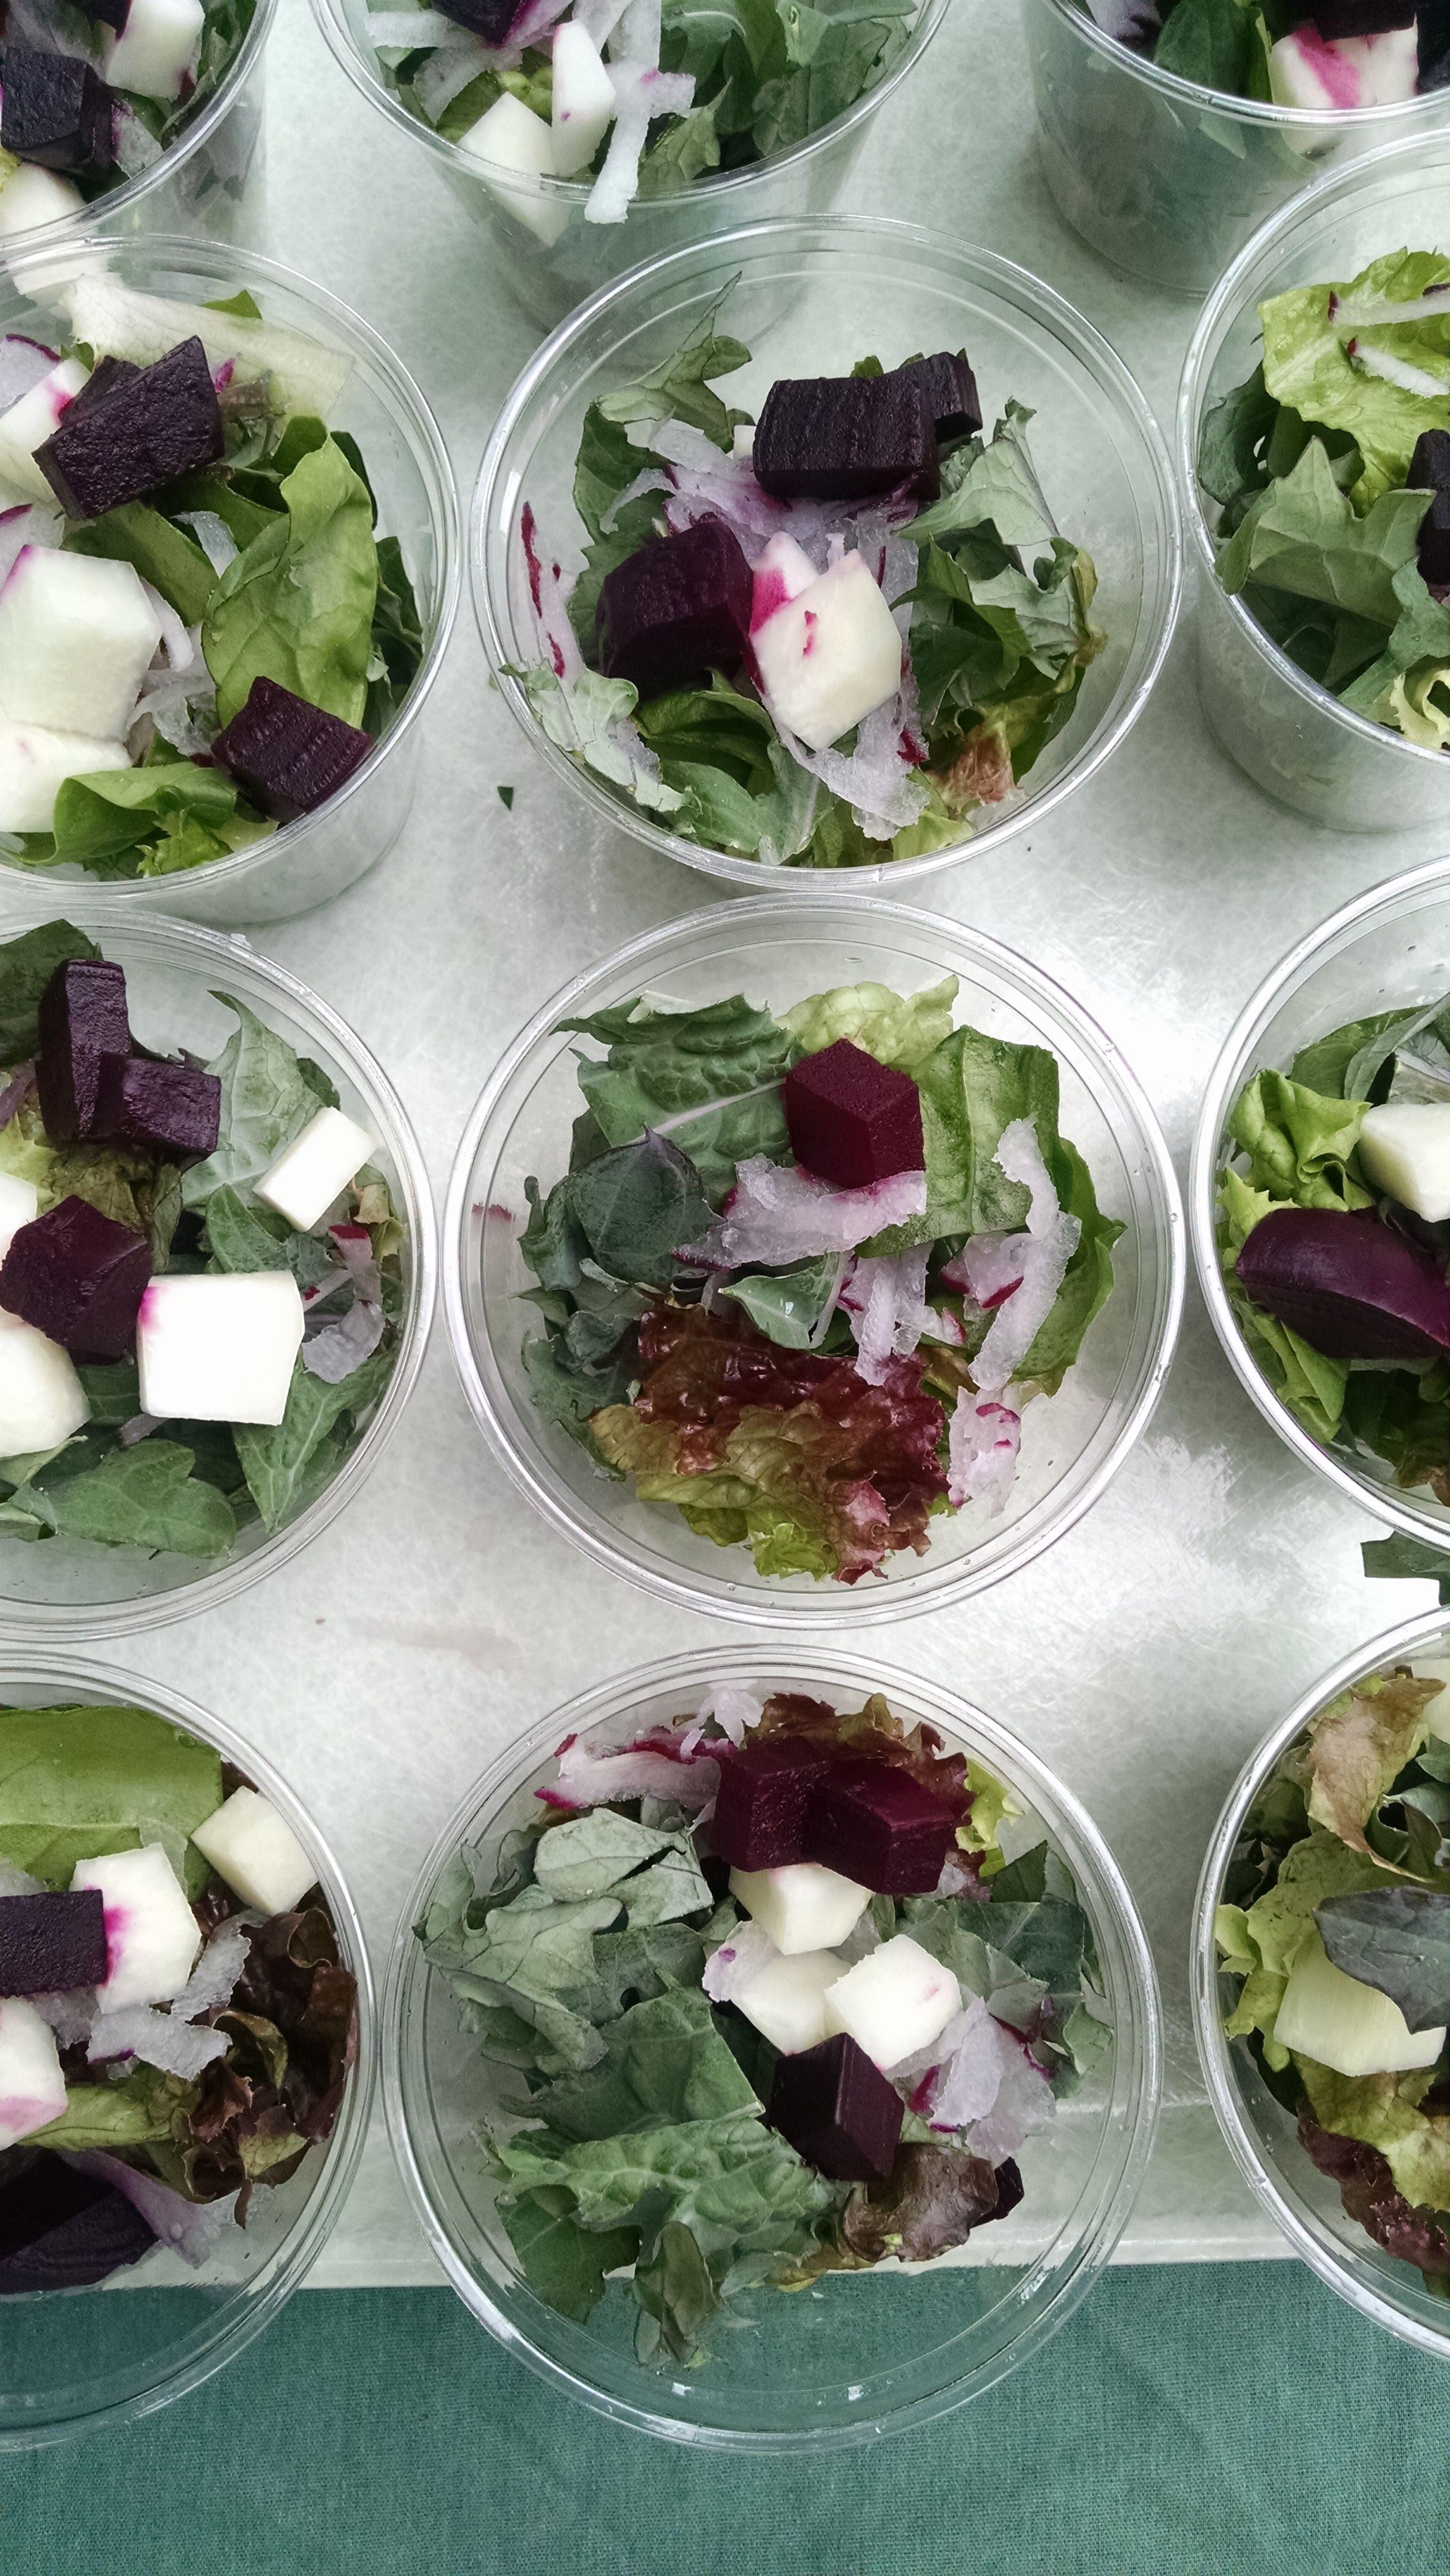 Salad samples